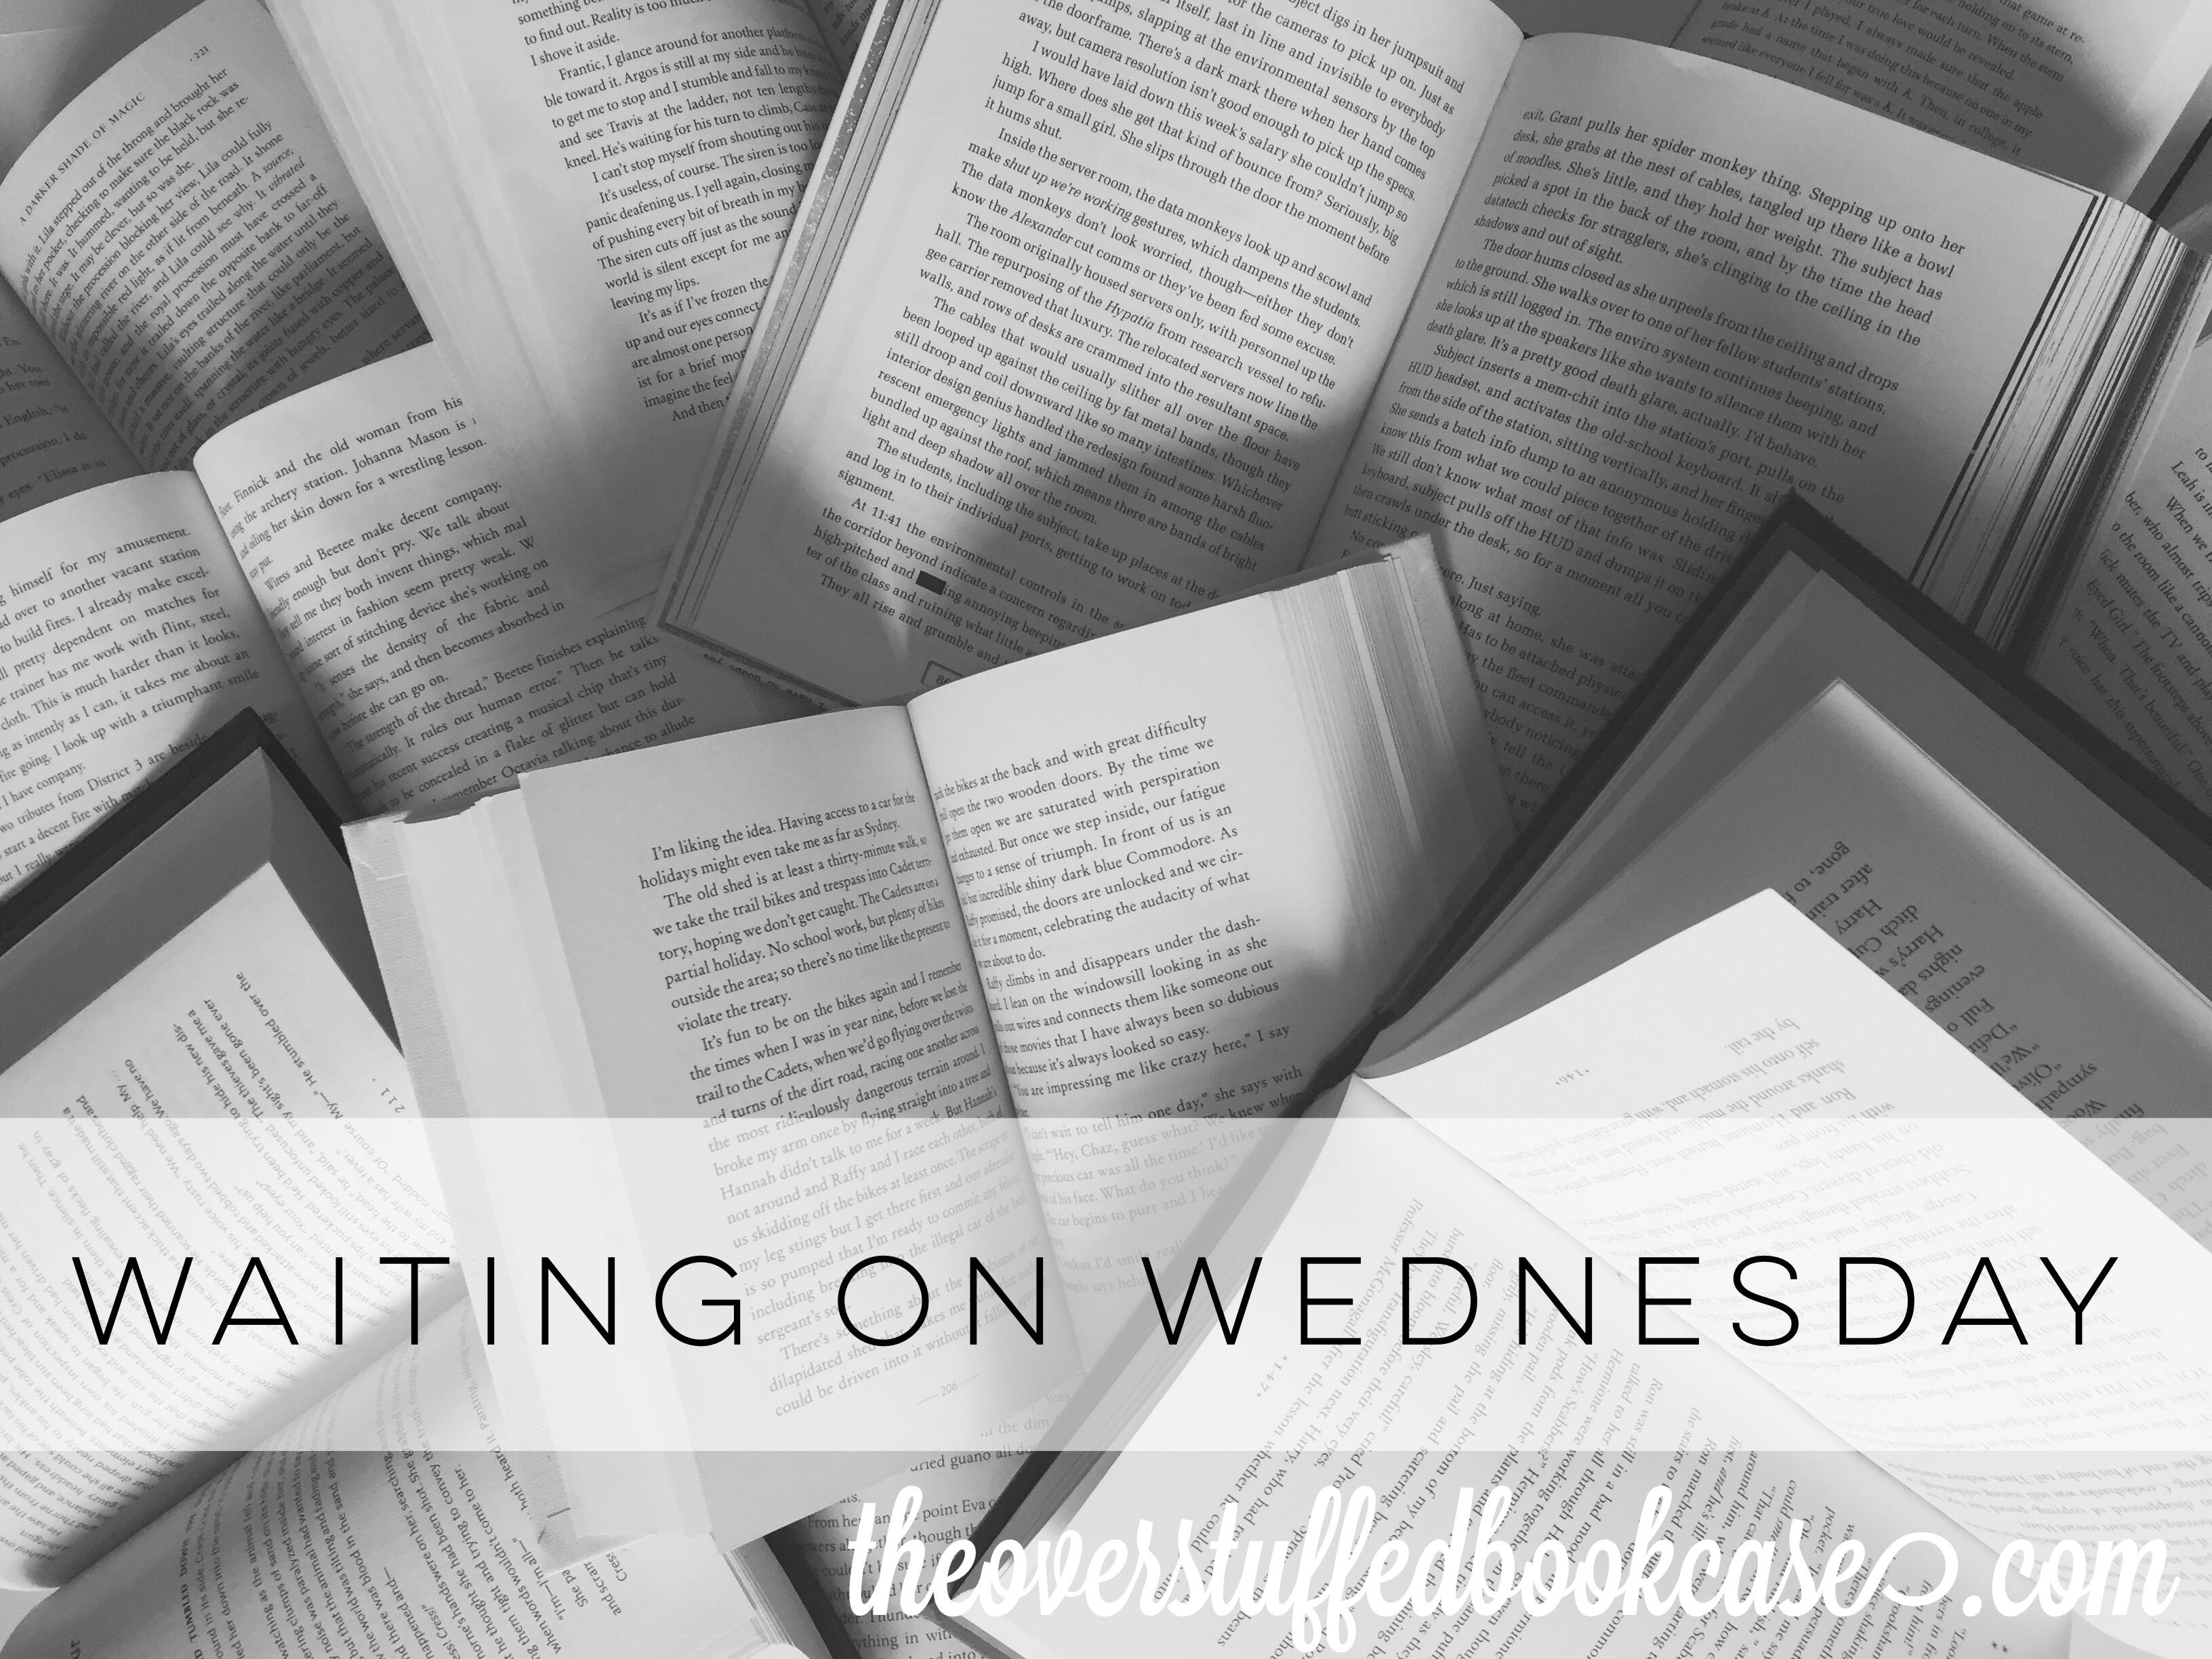 Waiting on Wednesday (76): Timekeeper by Tara Sim - The Overstuffed